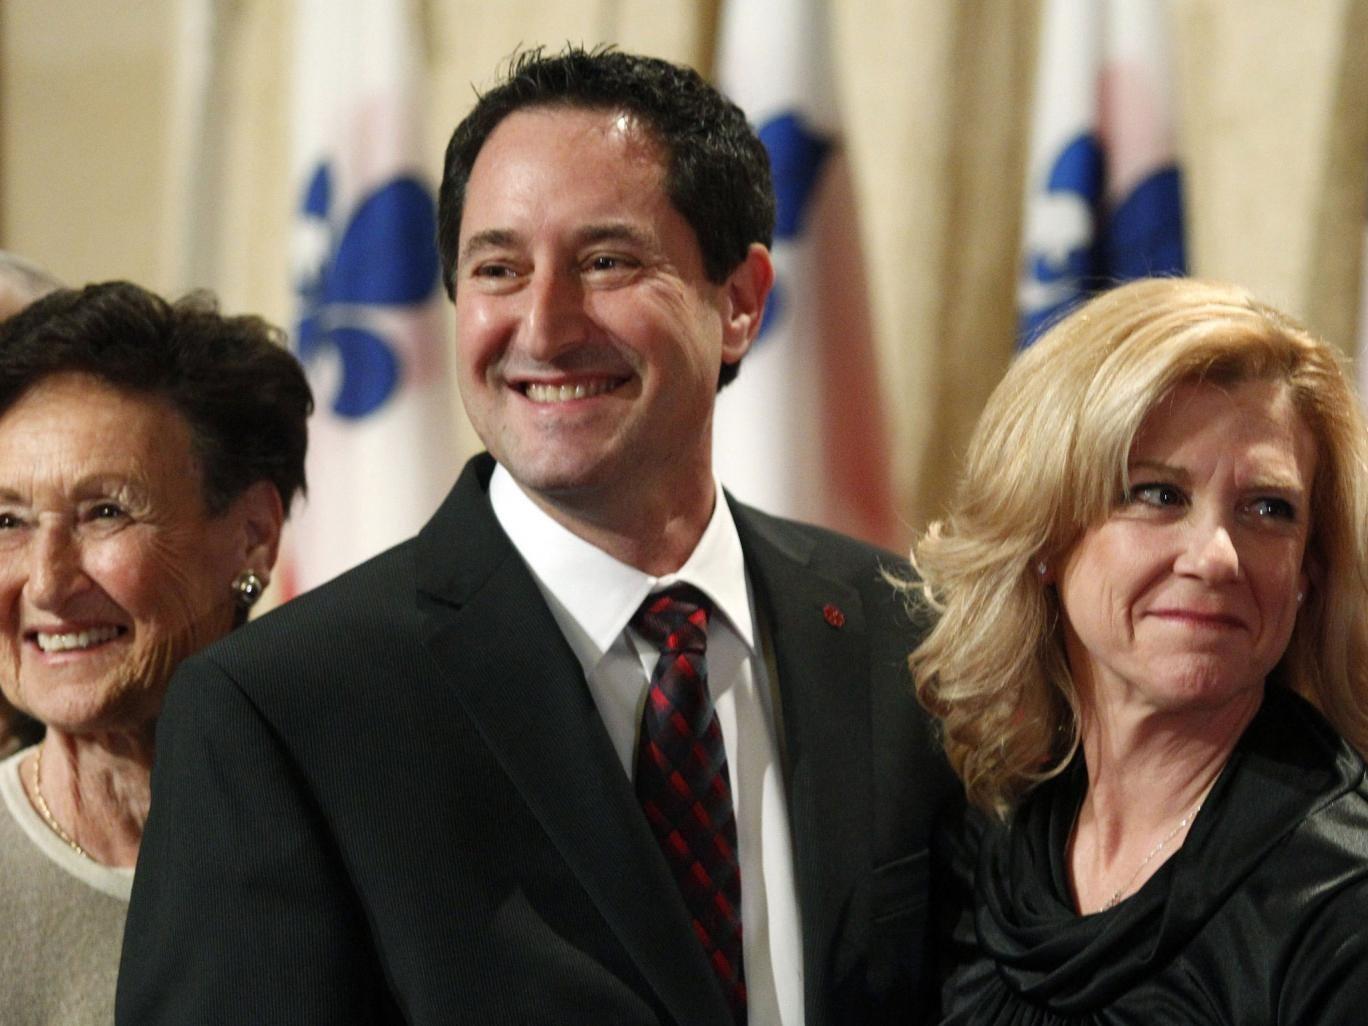 Mr Applebaum became interim mayor last November when his predecessor resigned amid corruption allegations